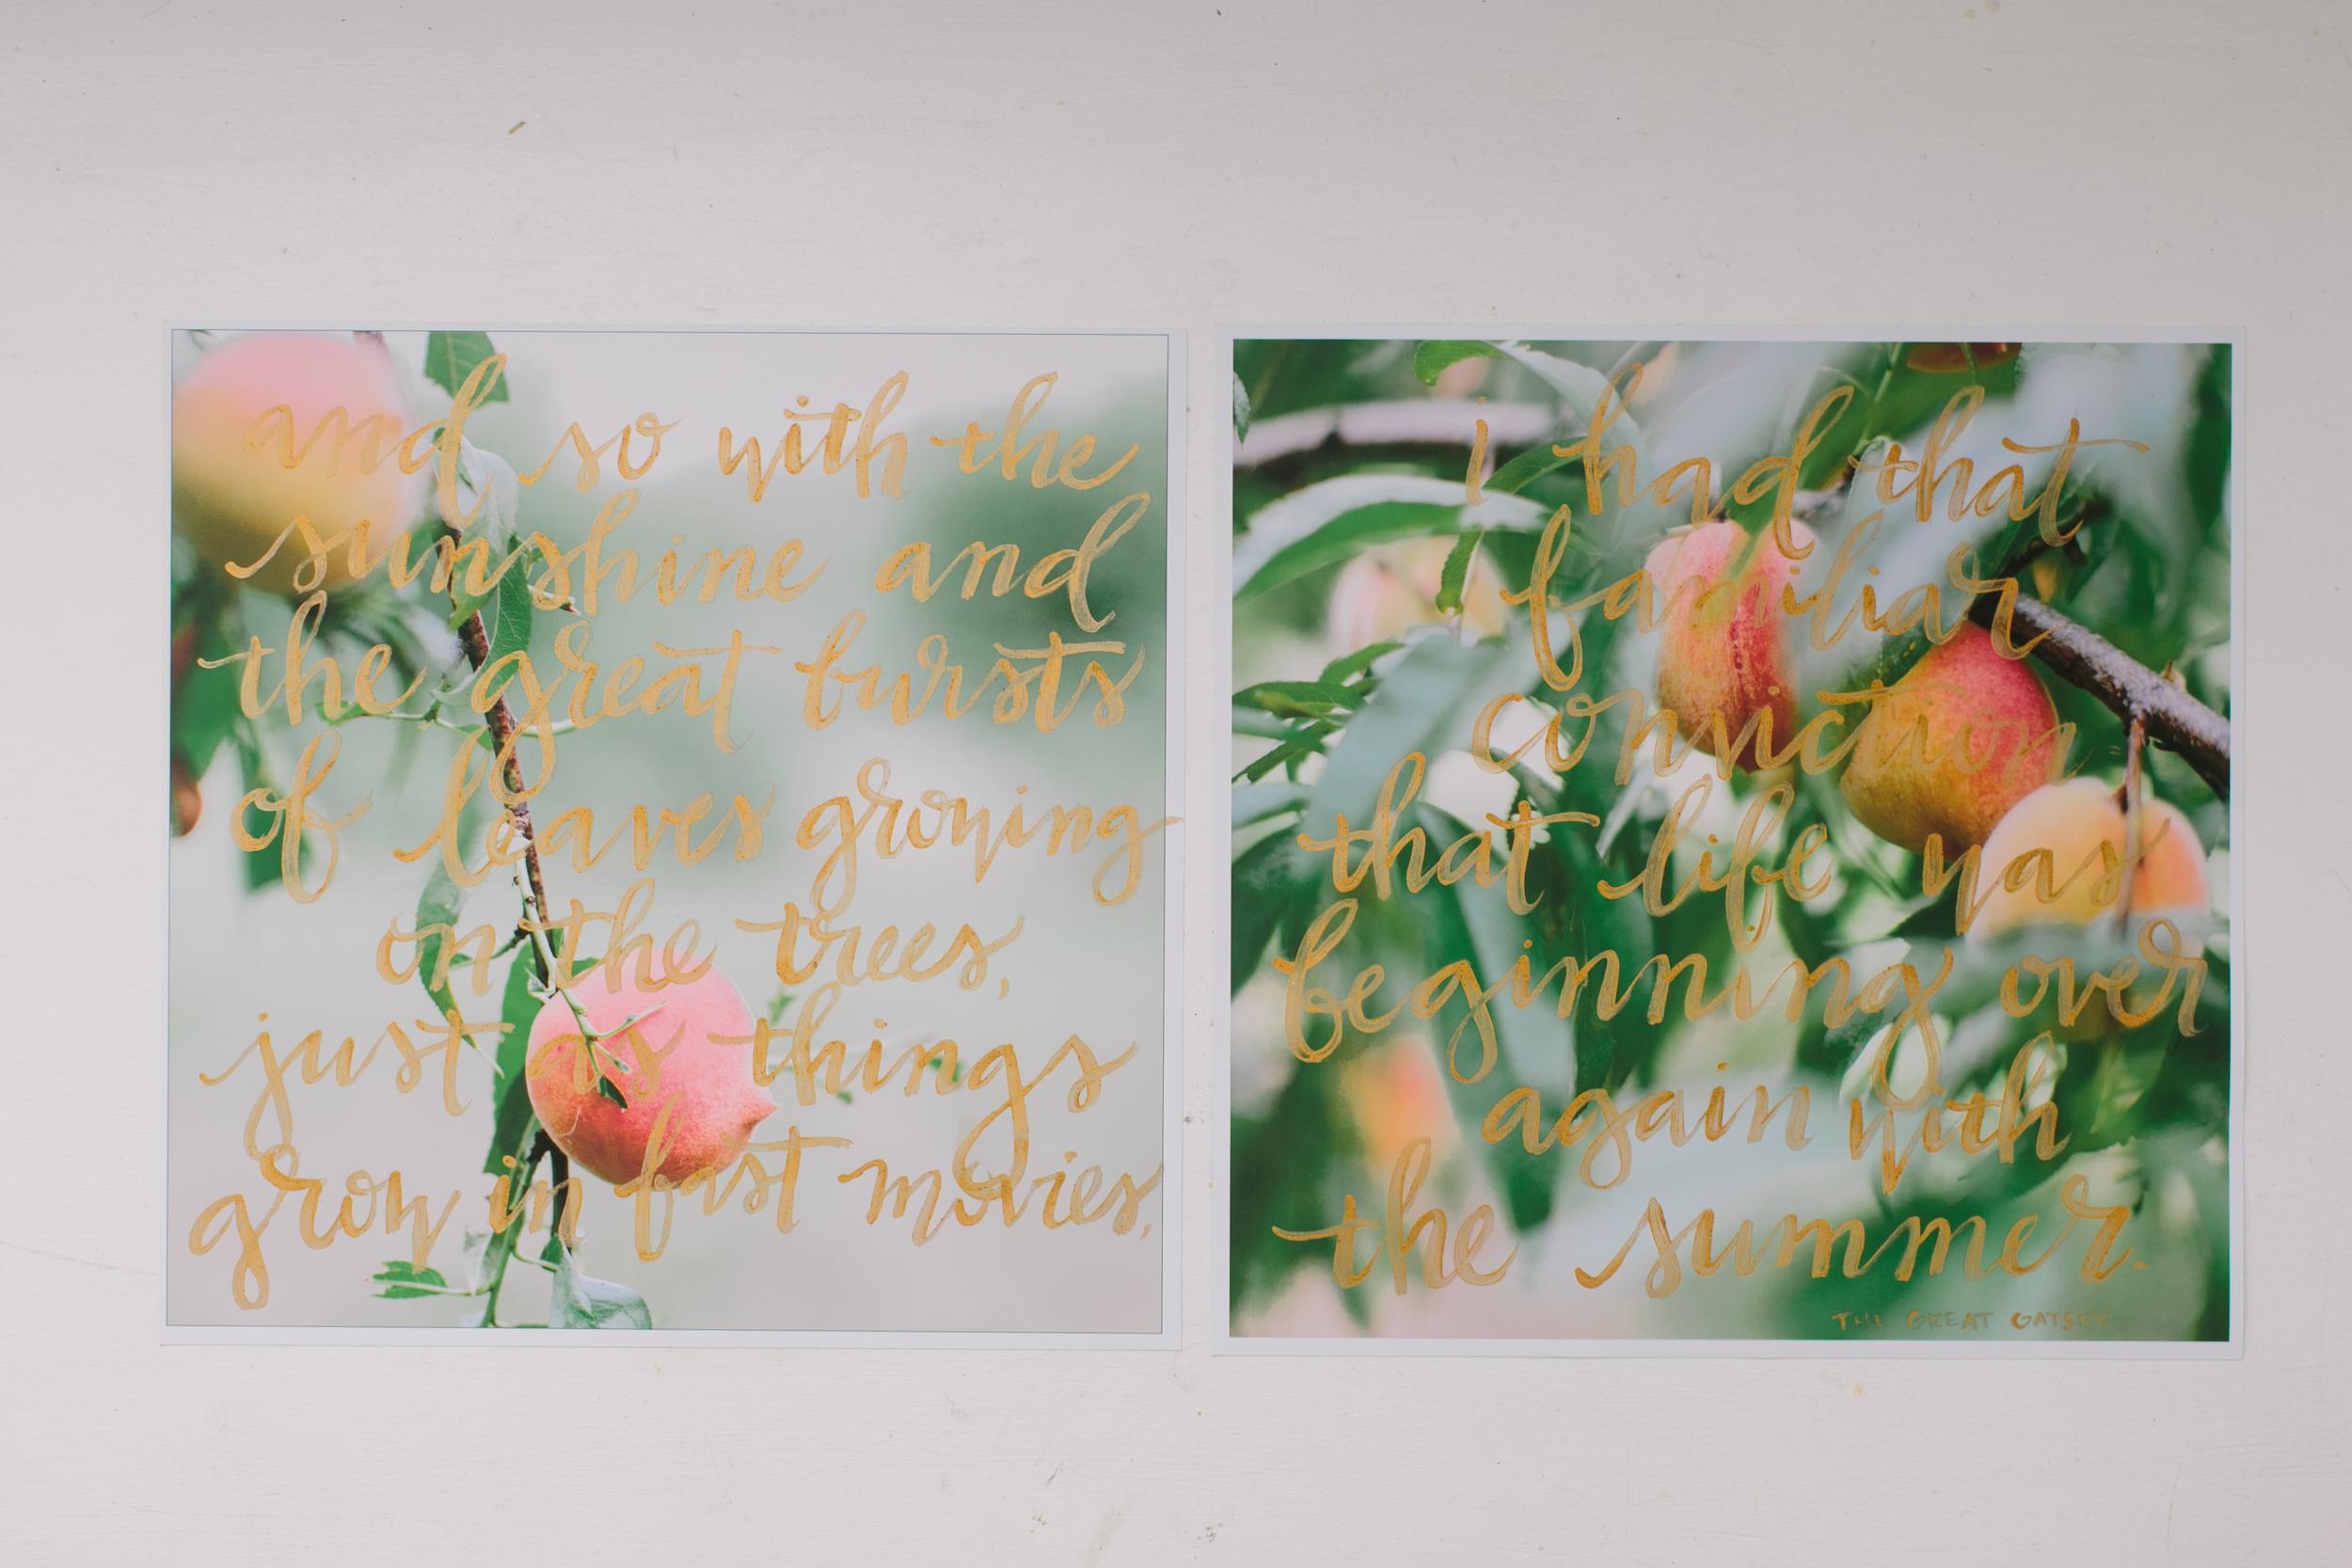 Kathryn-McCrary-Photography-Jenn-Gietzen-Write-On-Designs-Market-Collab-Peaches-115.jpg